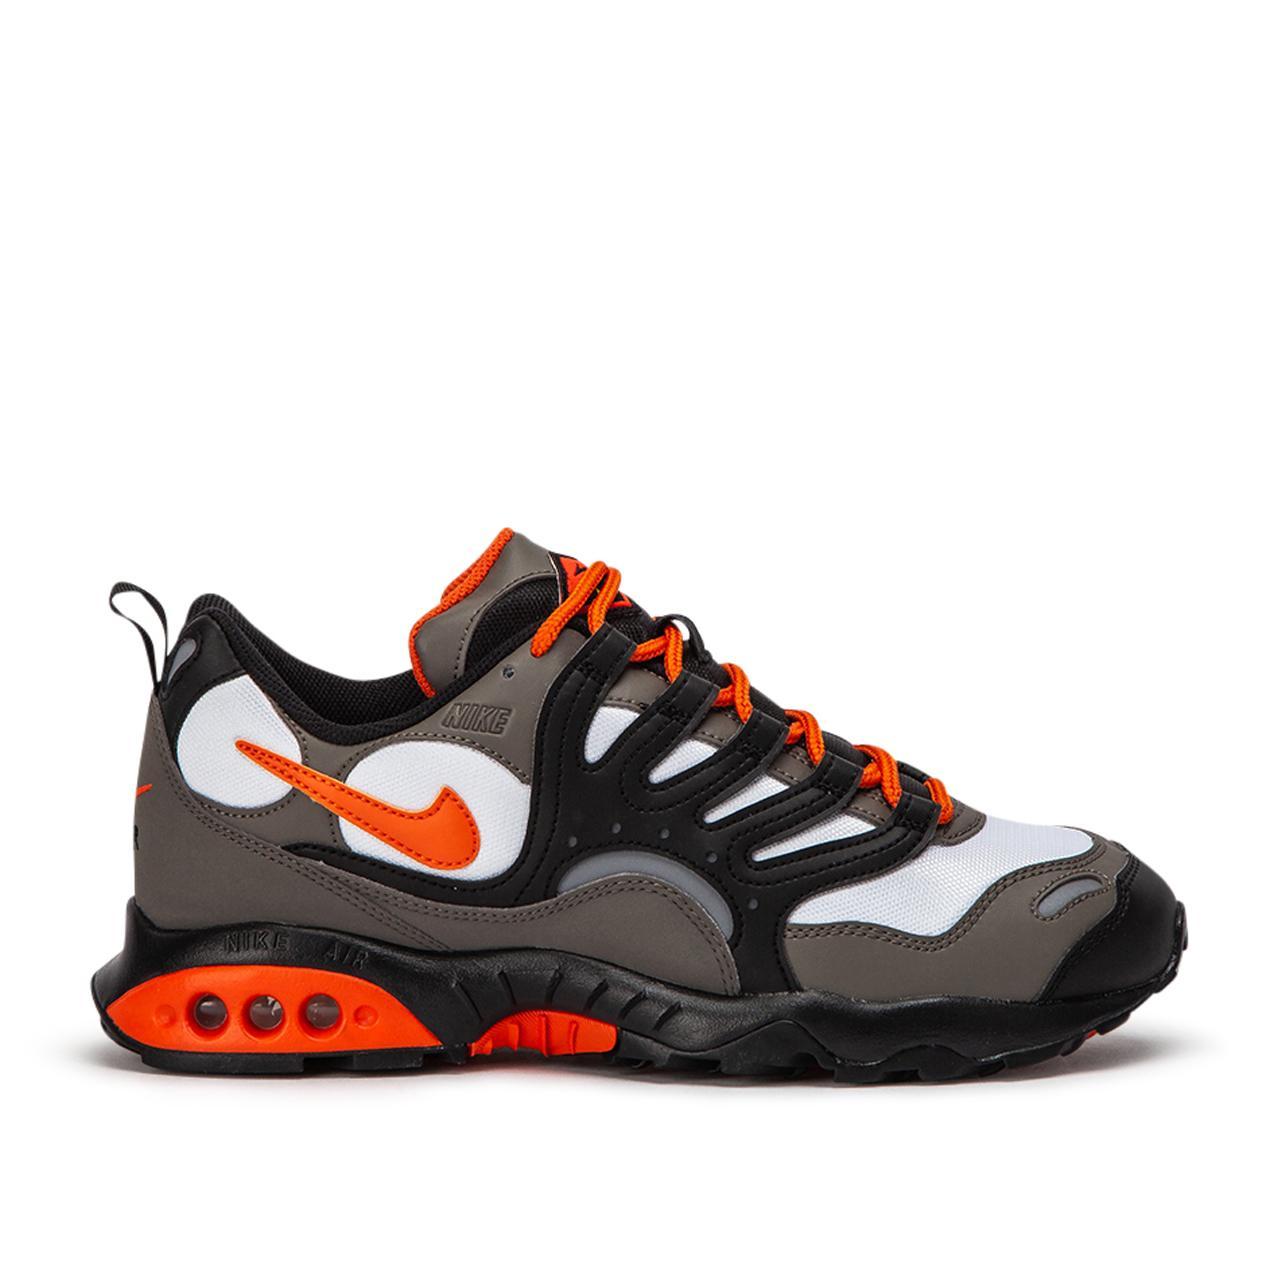 30b6777025fea3 ... Nike Air Terra Humara  18 for Men - Lyst. View fullscreen